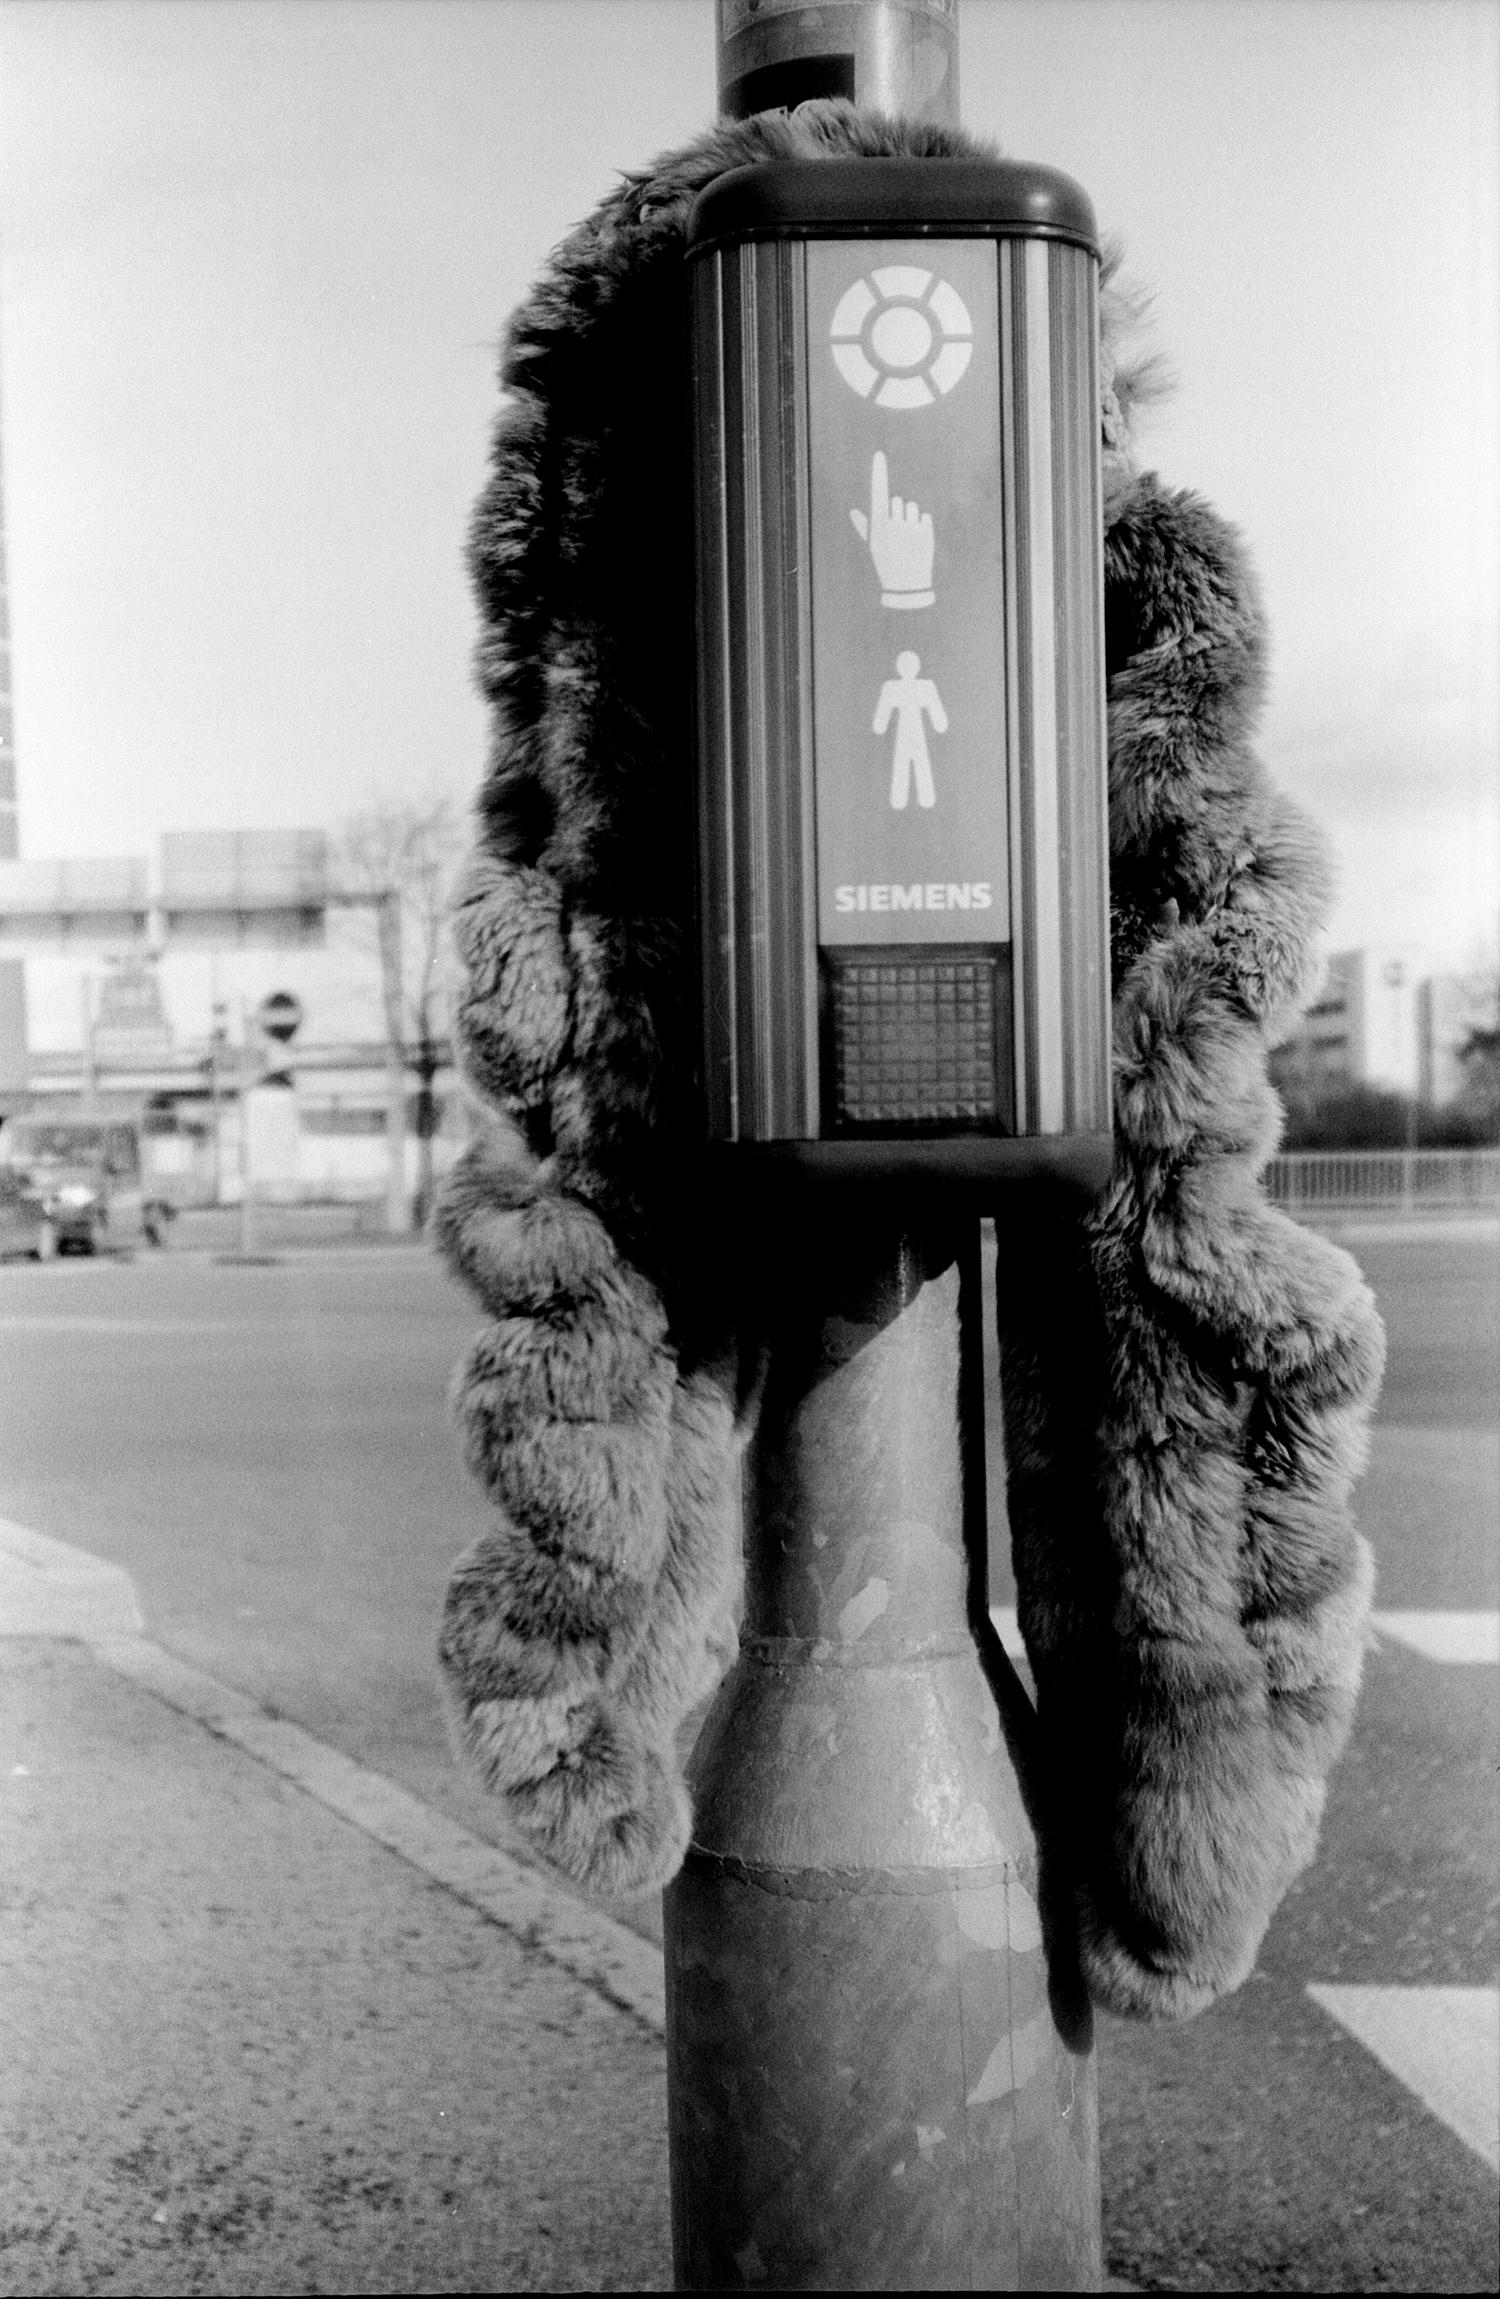 #055 The Lost Fur